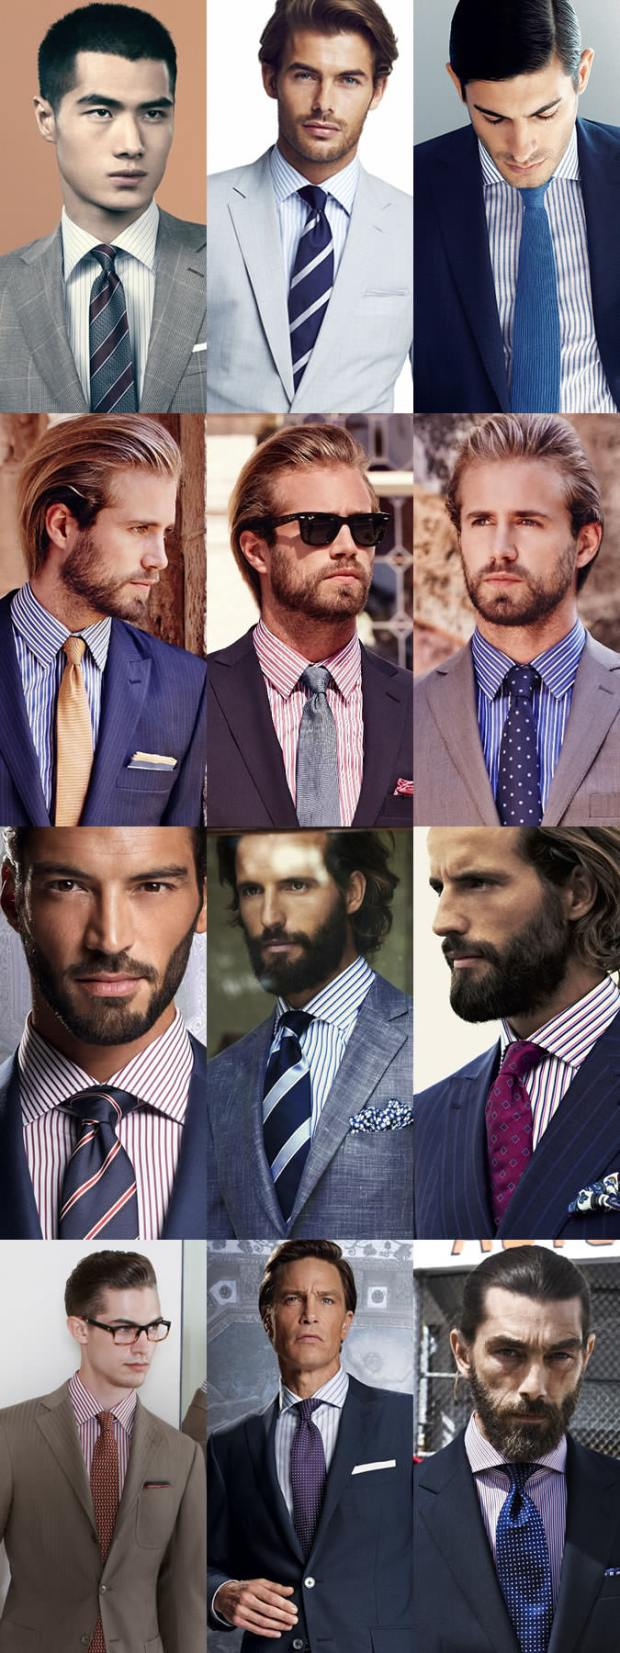 Camasa in dungi ce cravata se portiveste